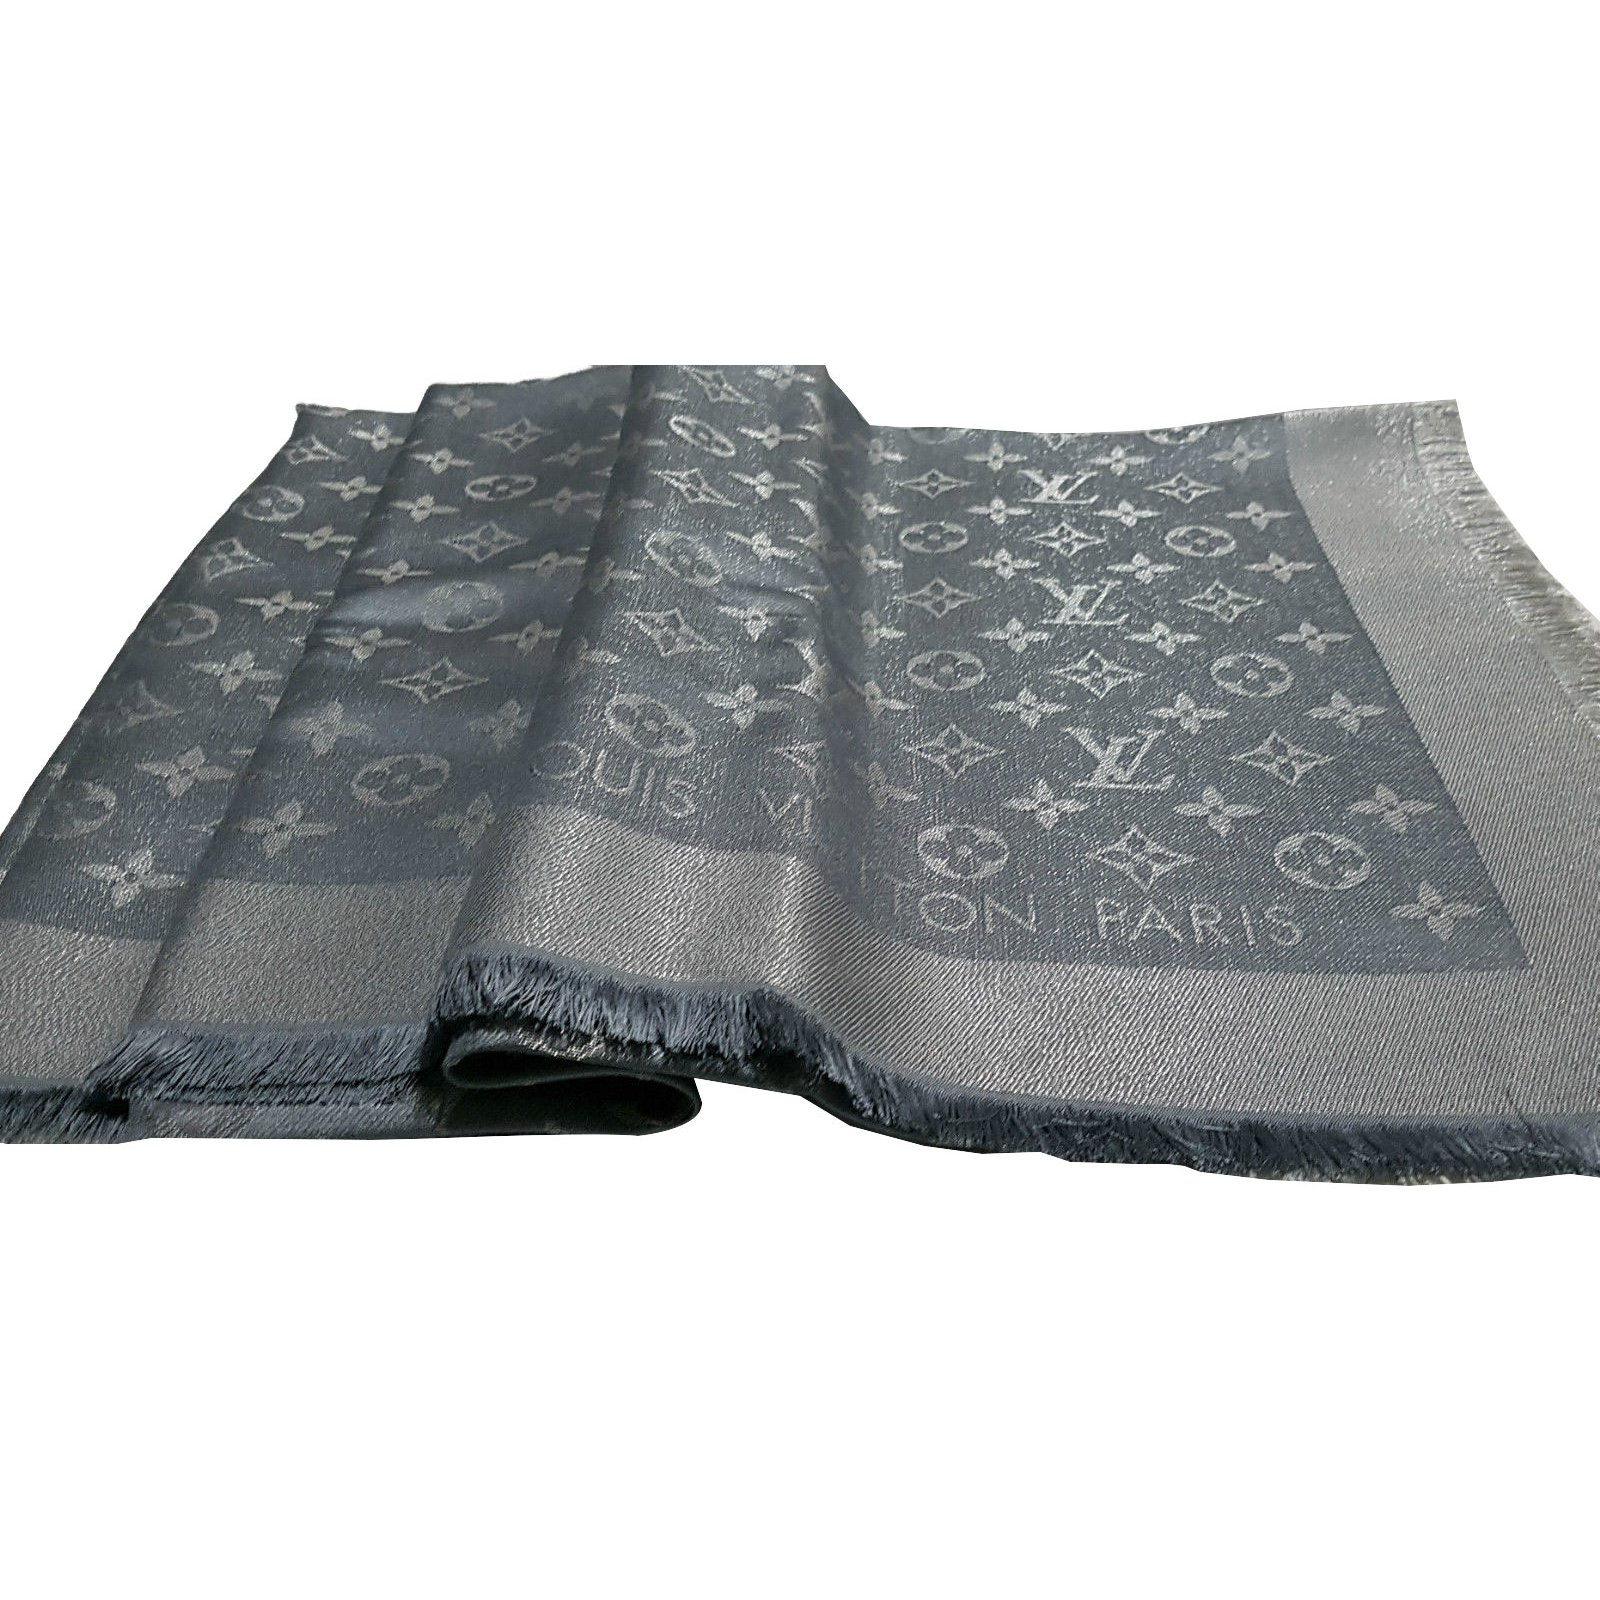 Foulards Louis Vuitton Foulard monogramme Soie Gris ref.66076 - Joli ... 1adaecea325